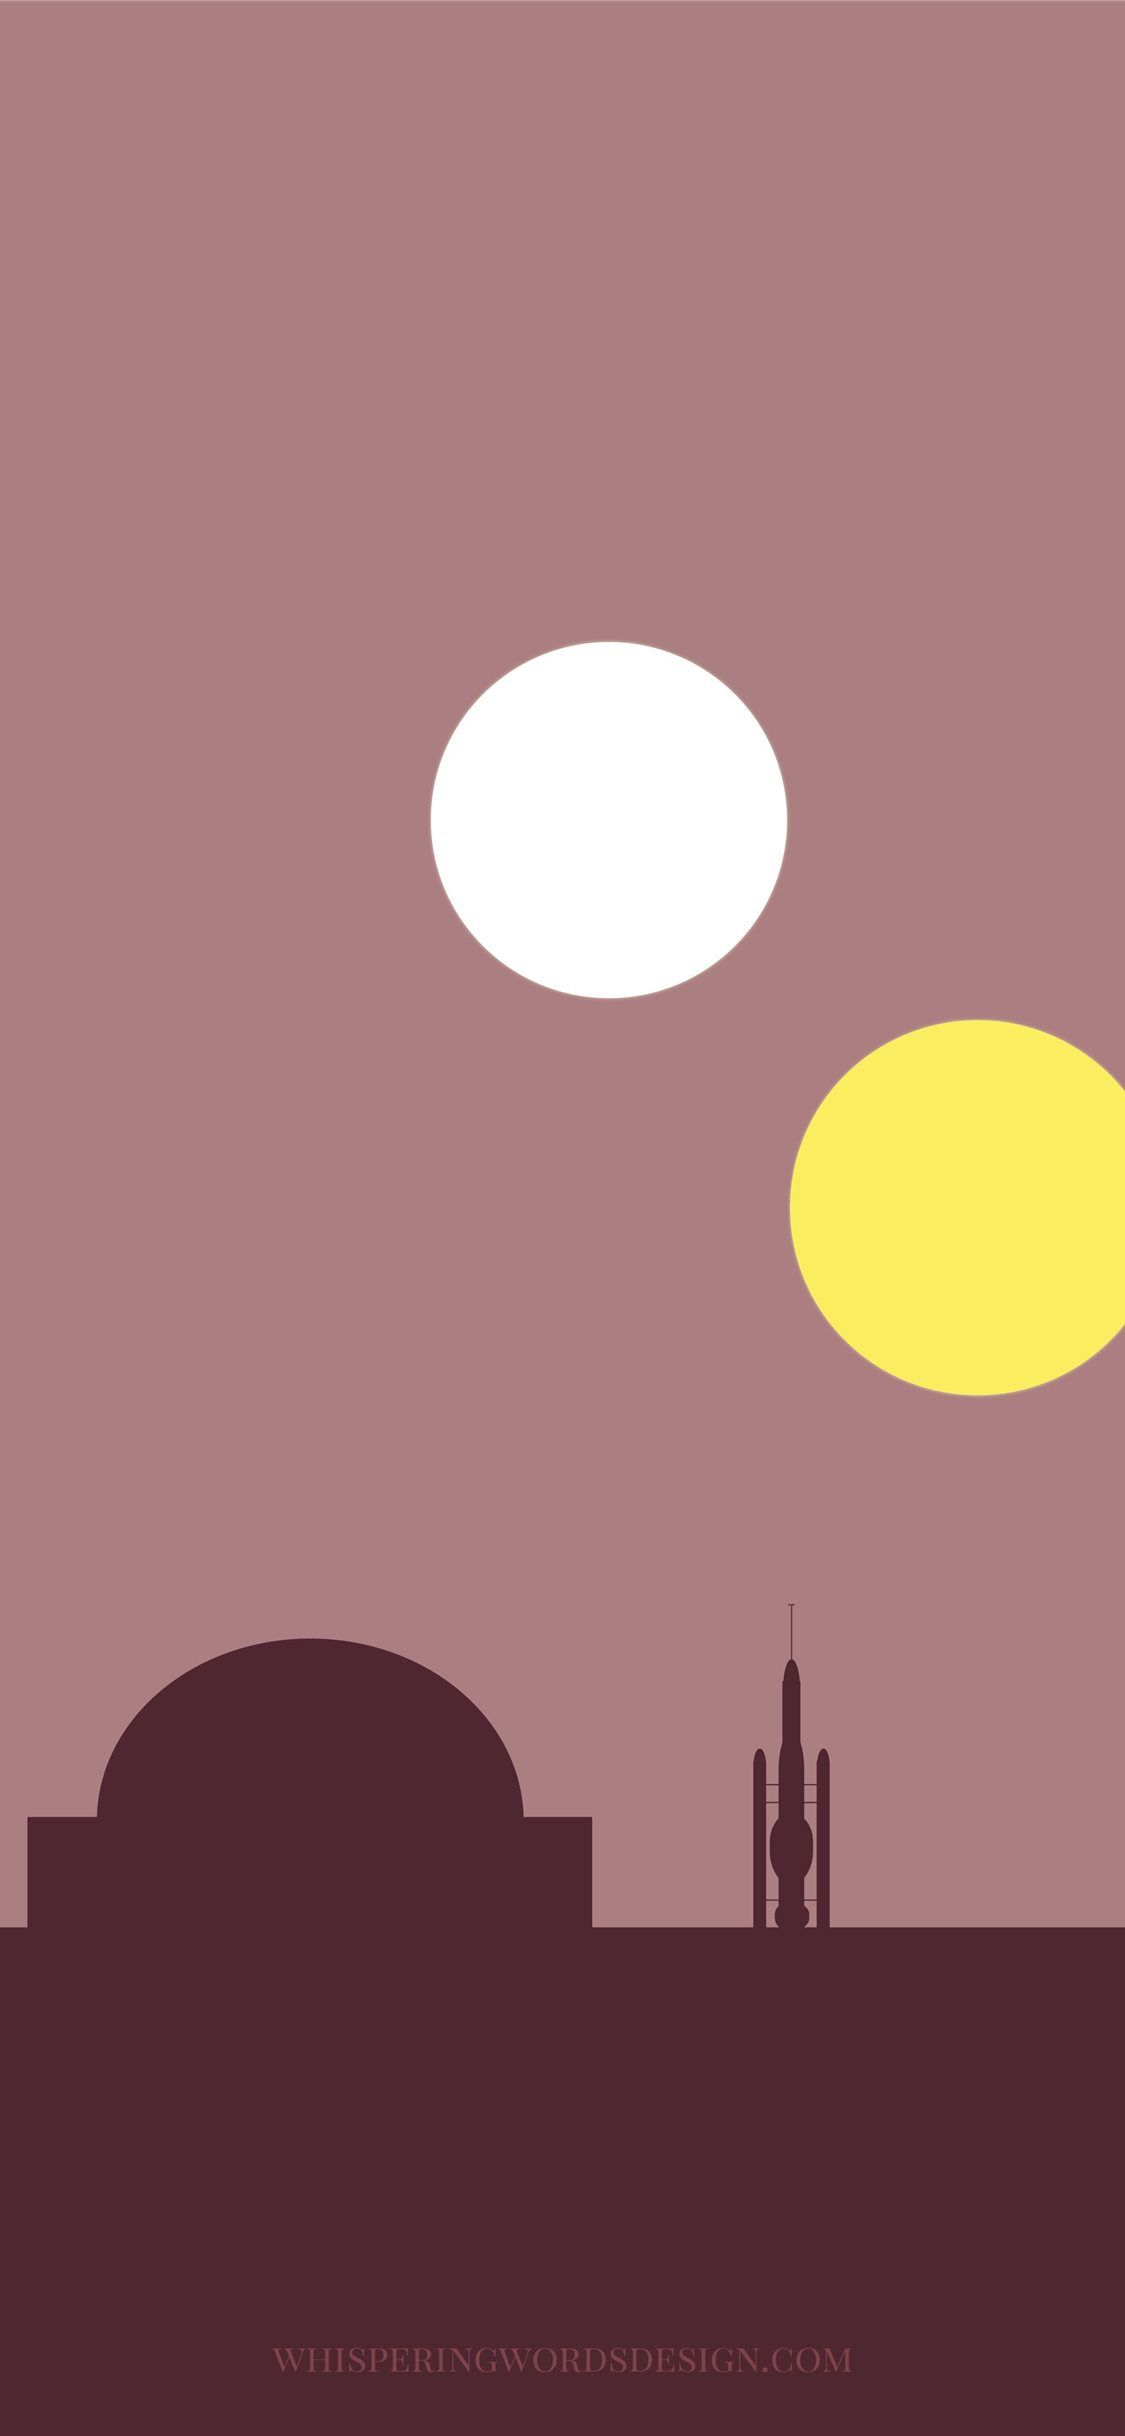 Minimalist Star Wars Iphone Hd Wallpapers Wallpaper Cave